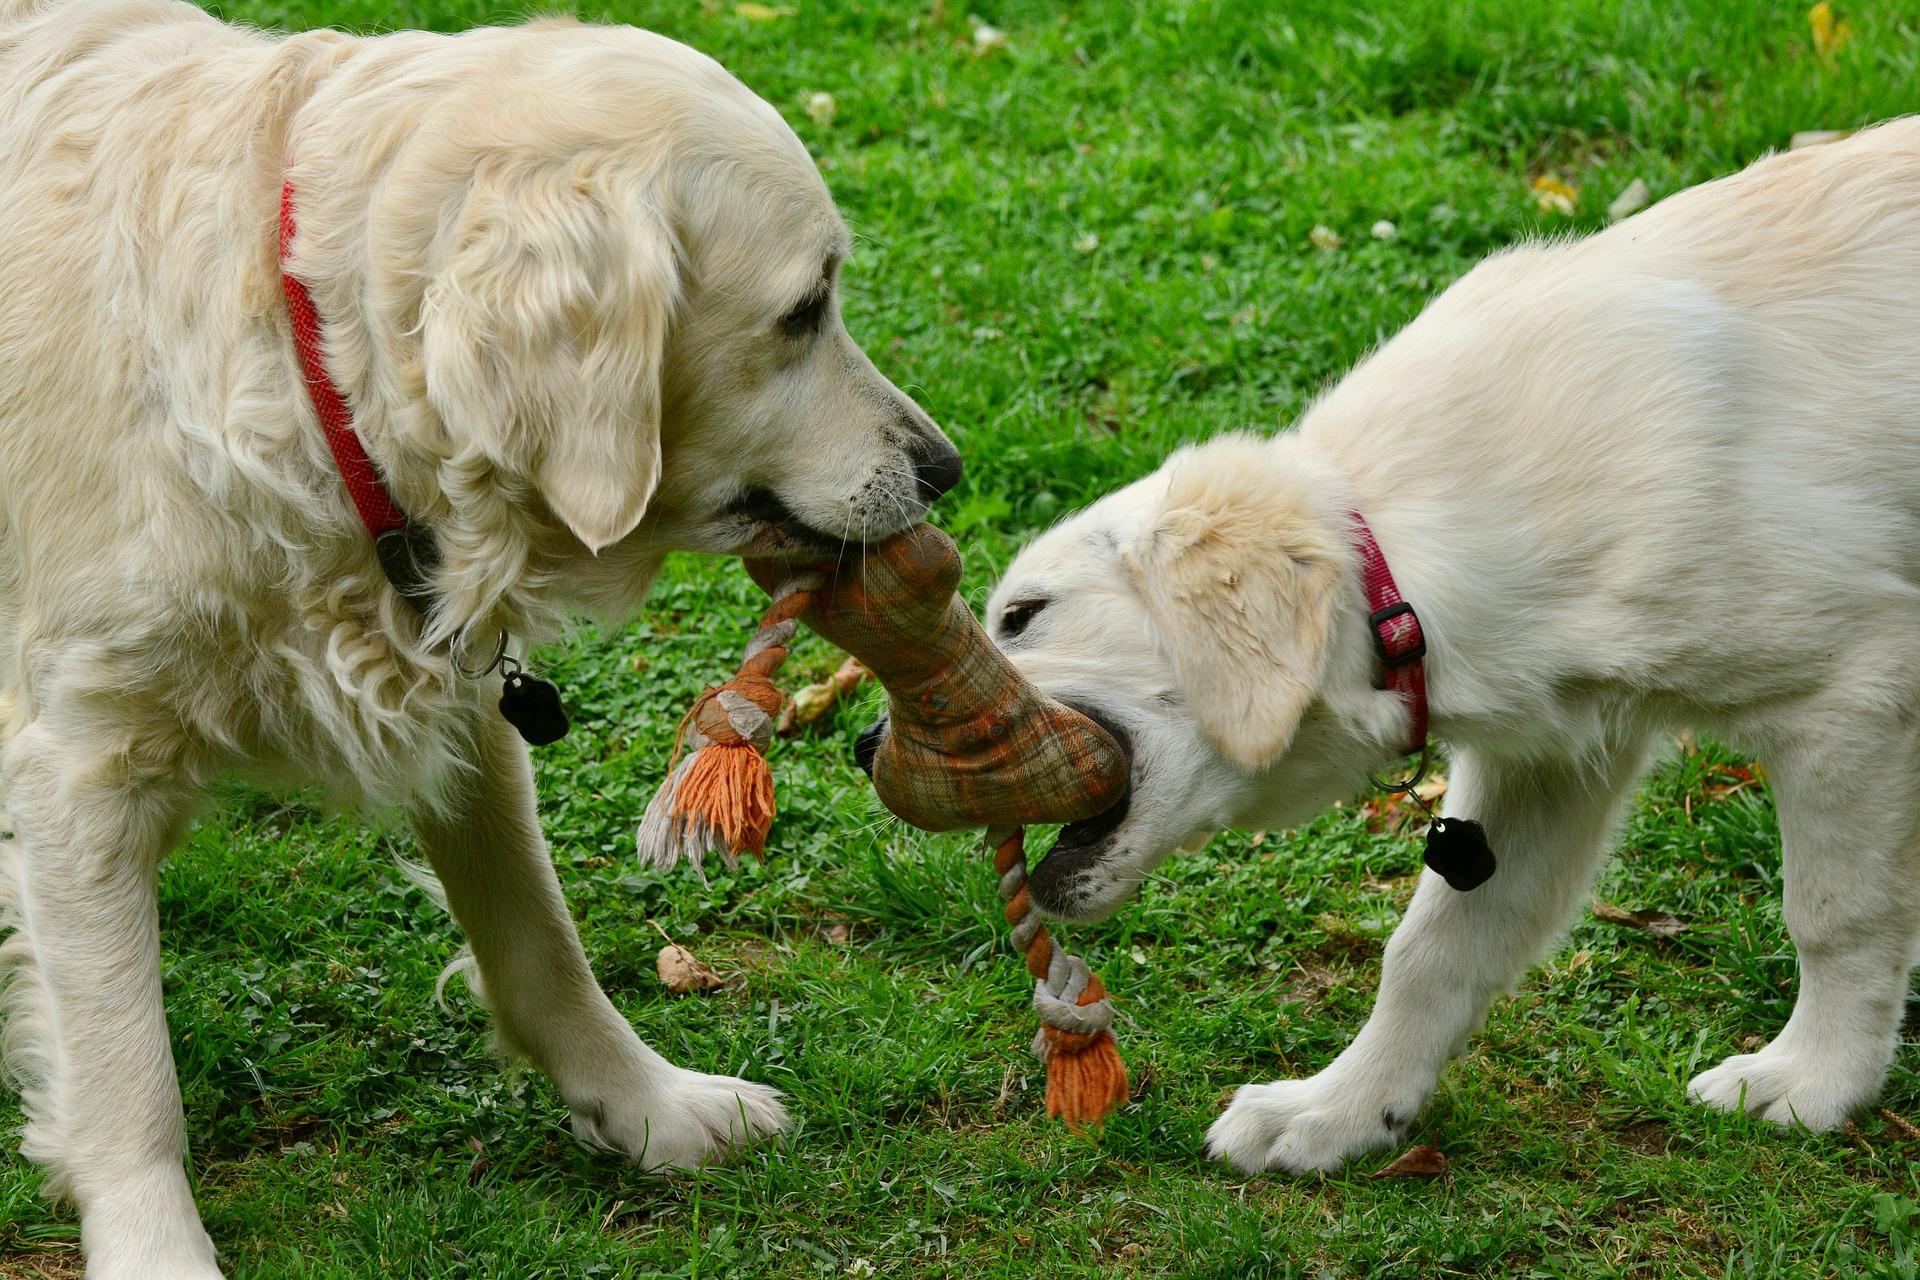 Dai, giochiamo insieme!